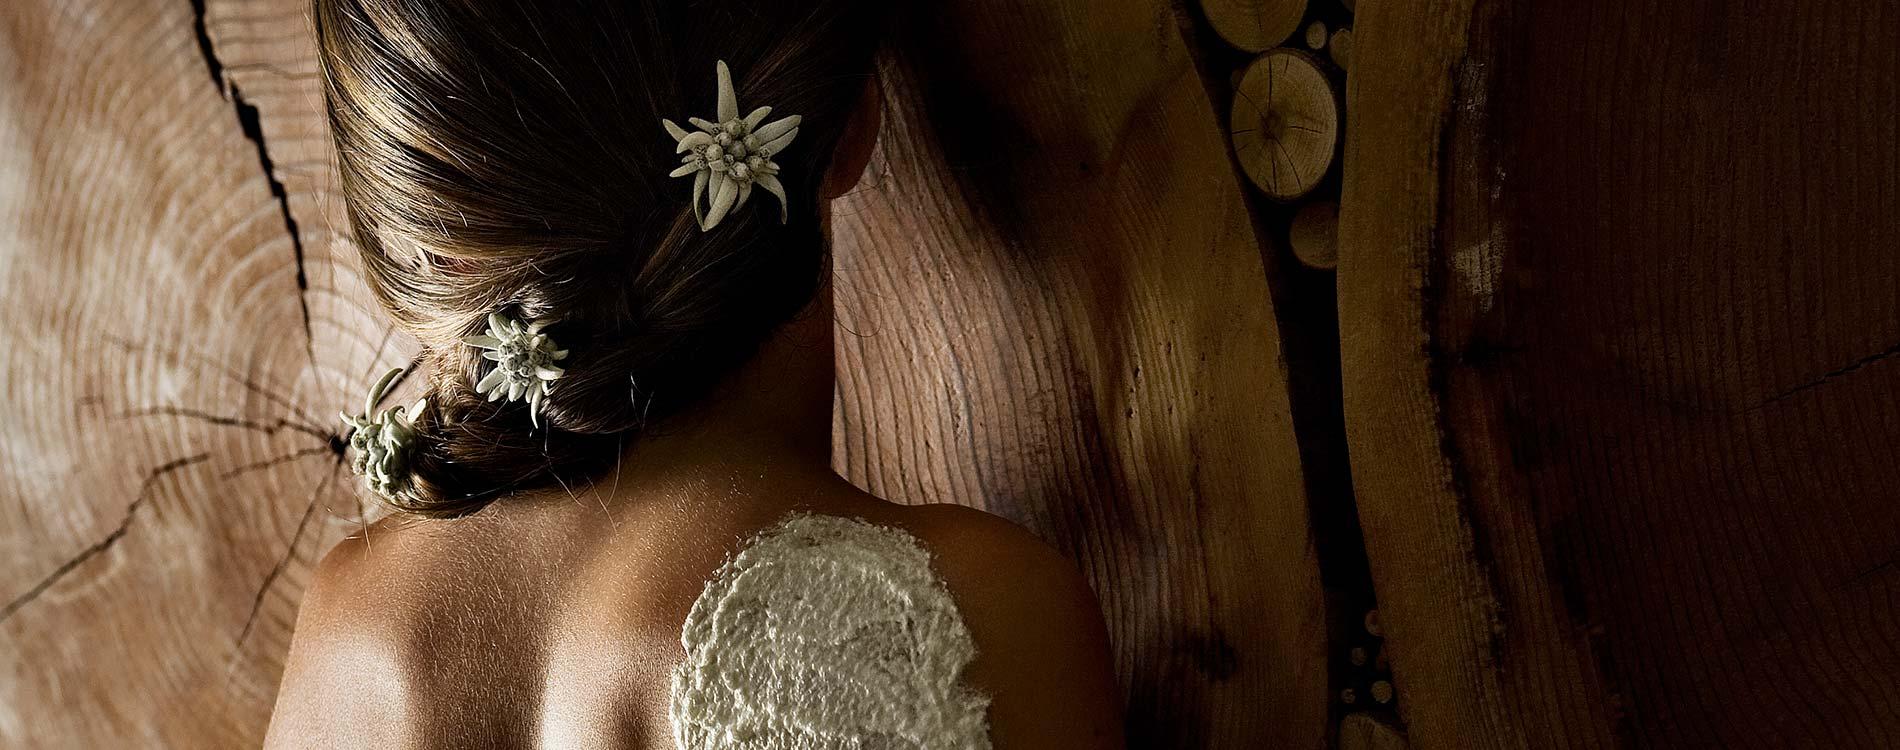 Shop pure altitude PROSPA Kosmetik Imst Kosmetikstudio Oberland